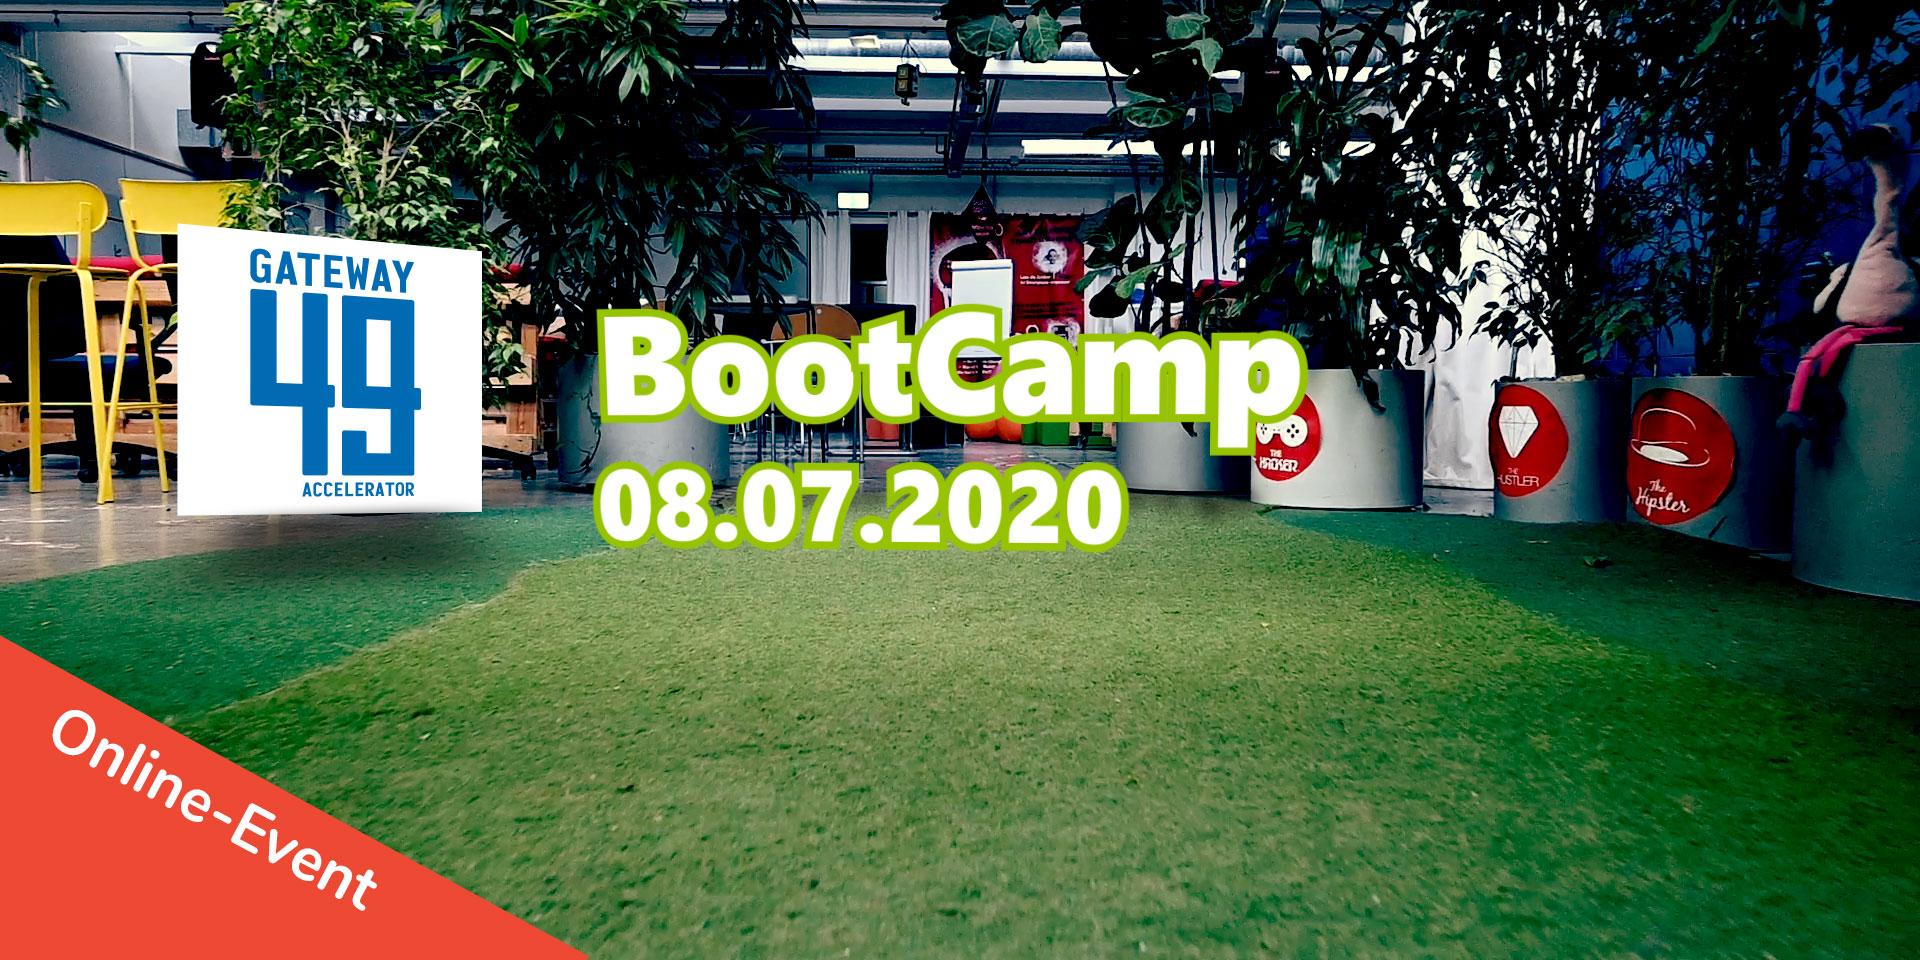 GATEWAY49 Bootcamp 2020